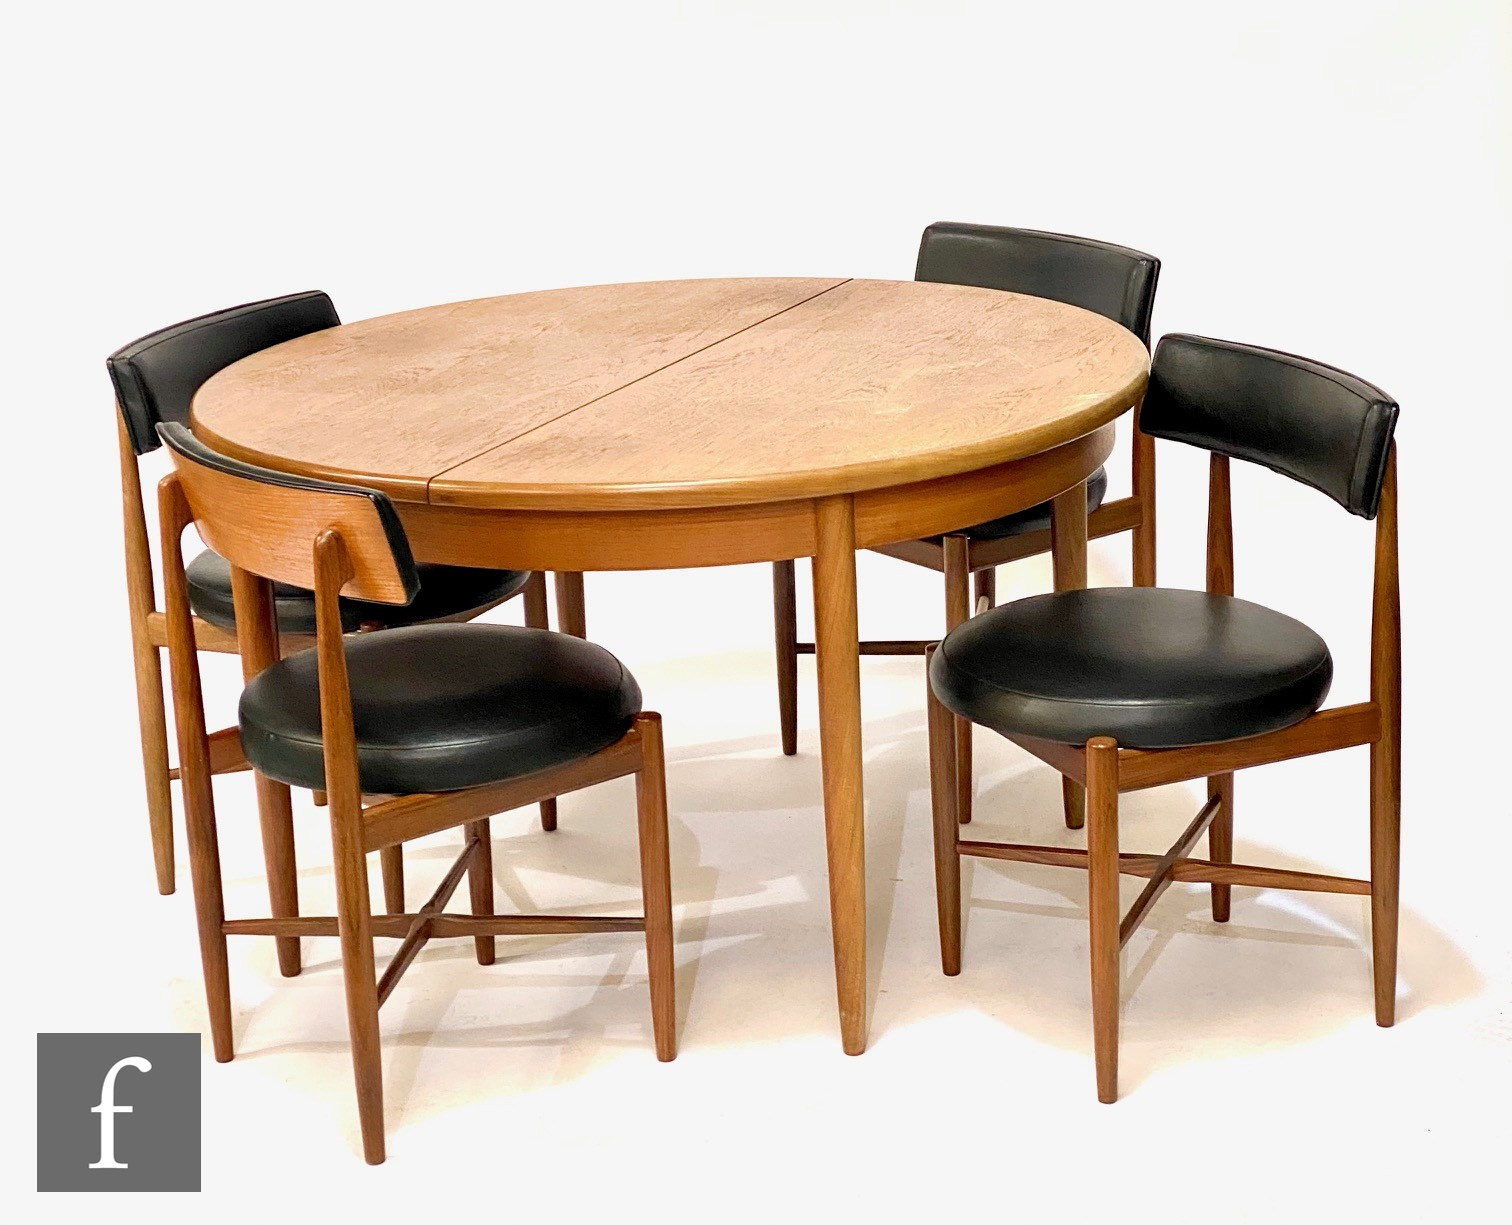 A G-Plan circular teak dining table, diameter 123cm, and a set of four black vinyl upholstered